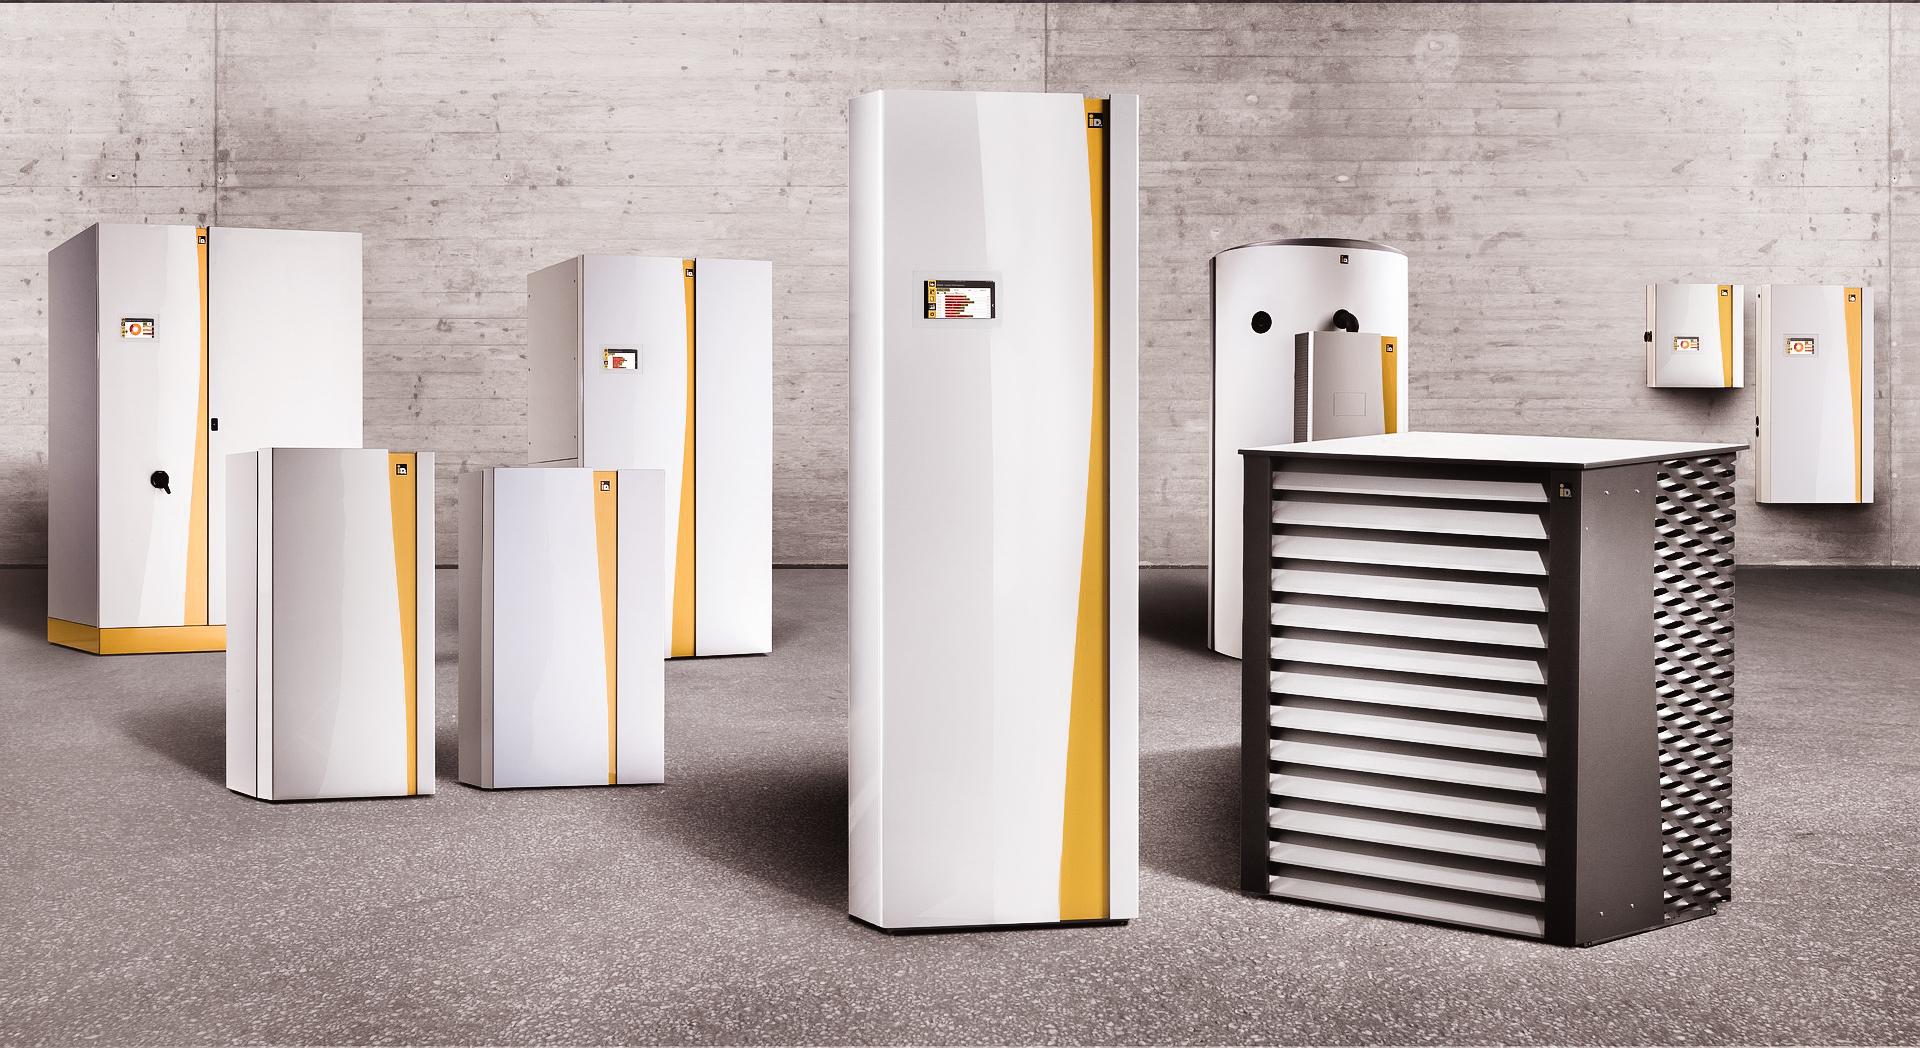 Furnace VS Boiler VS Heat Pump @MeldrumDesign